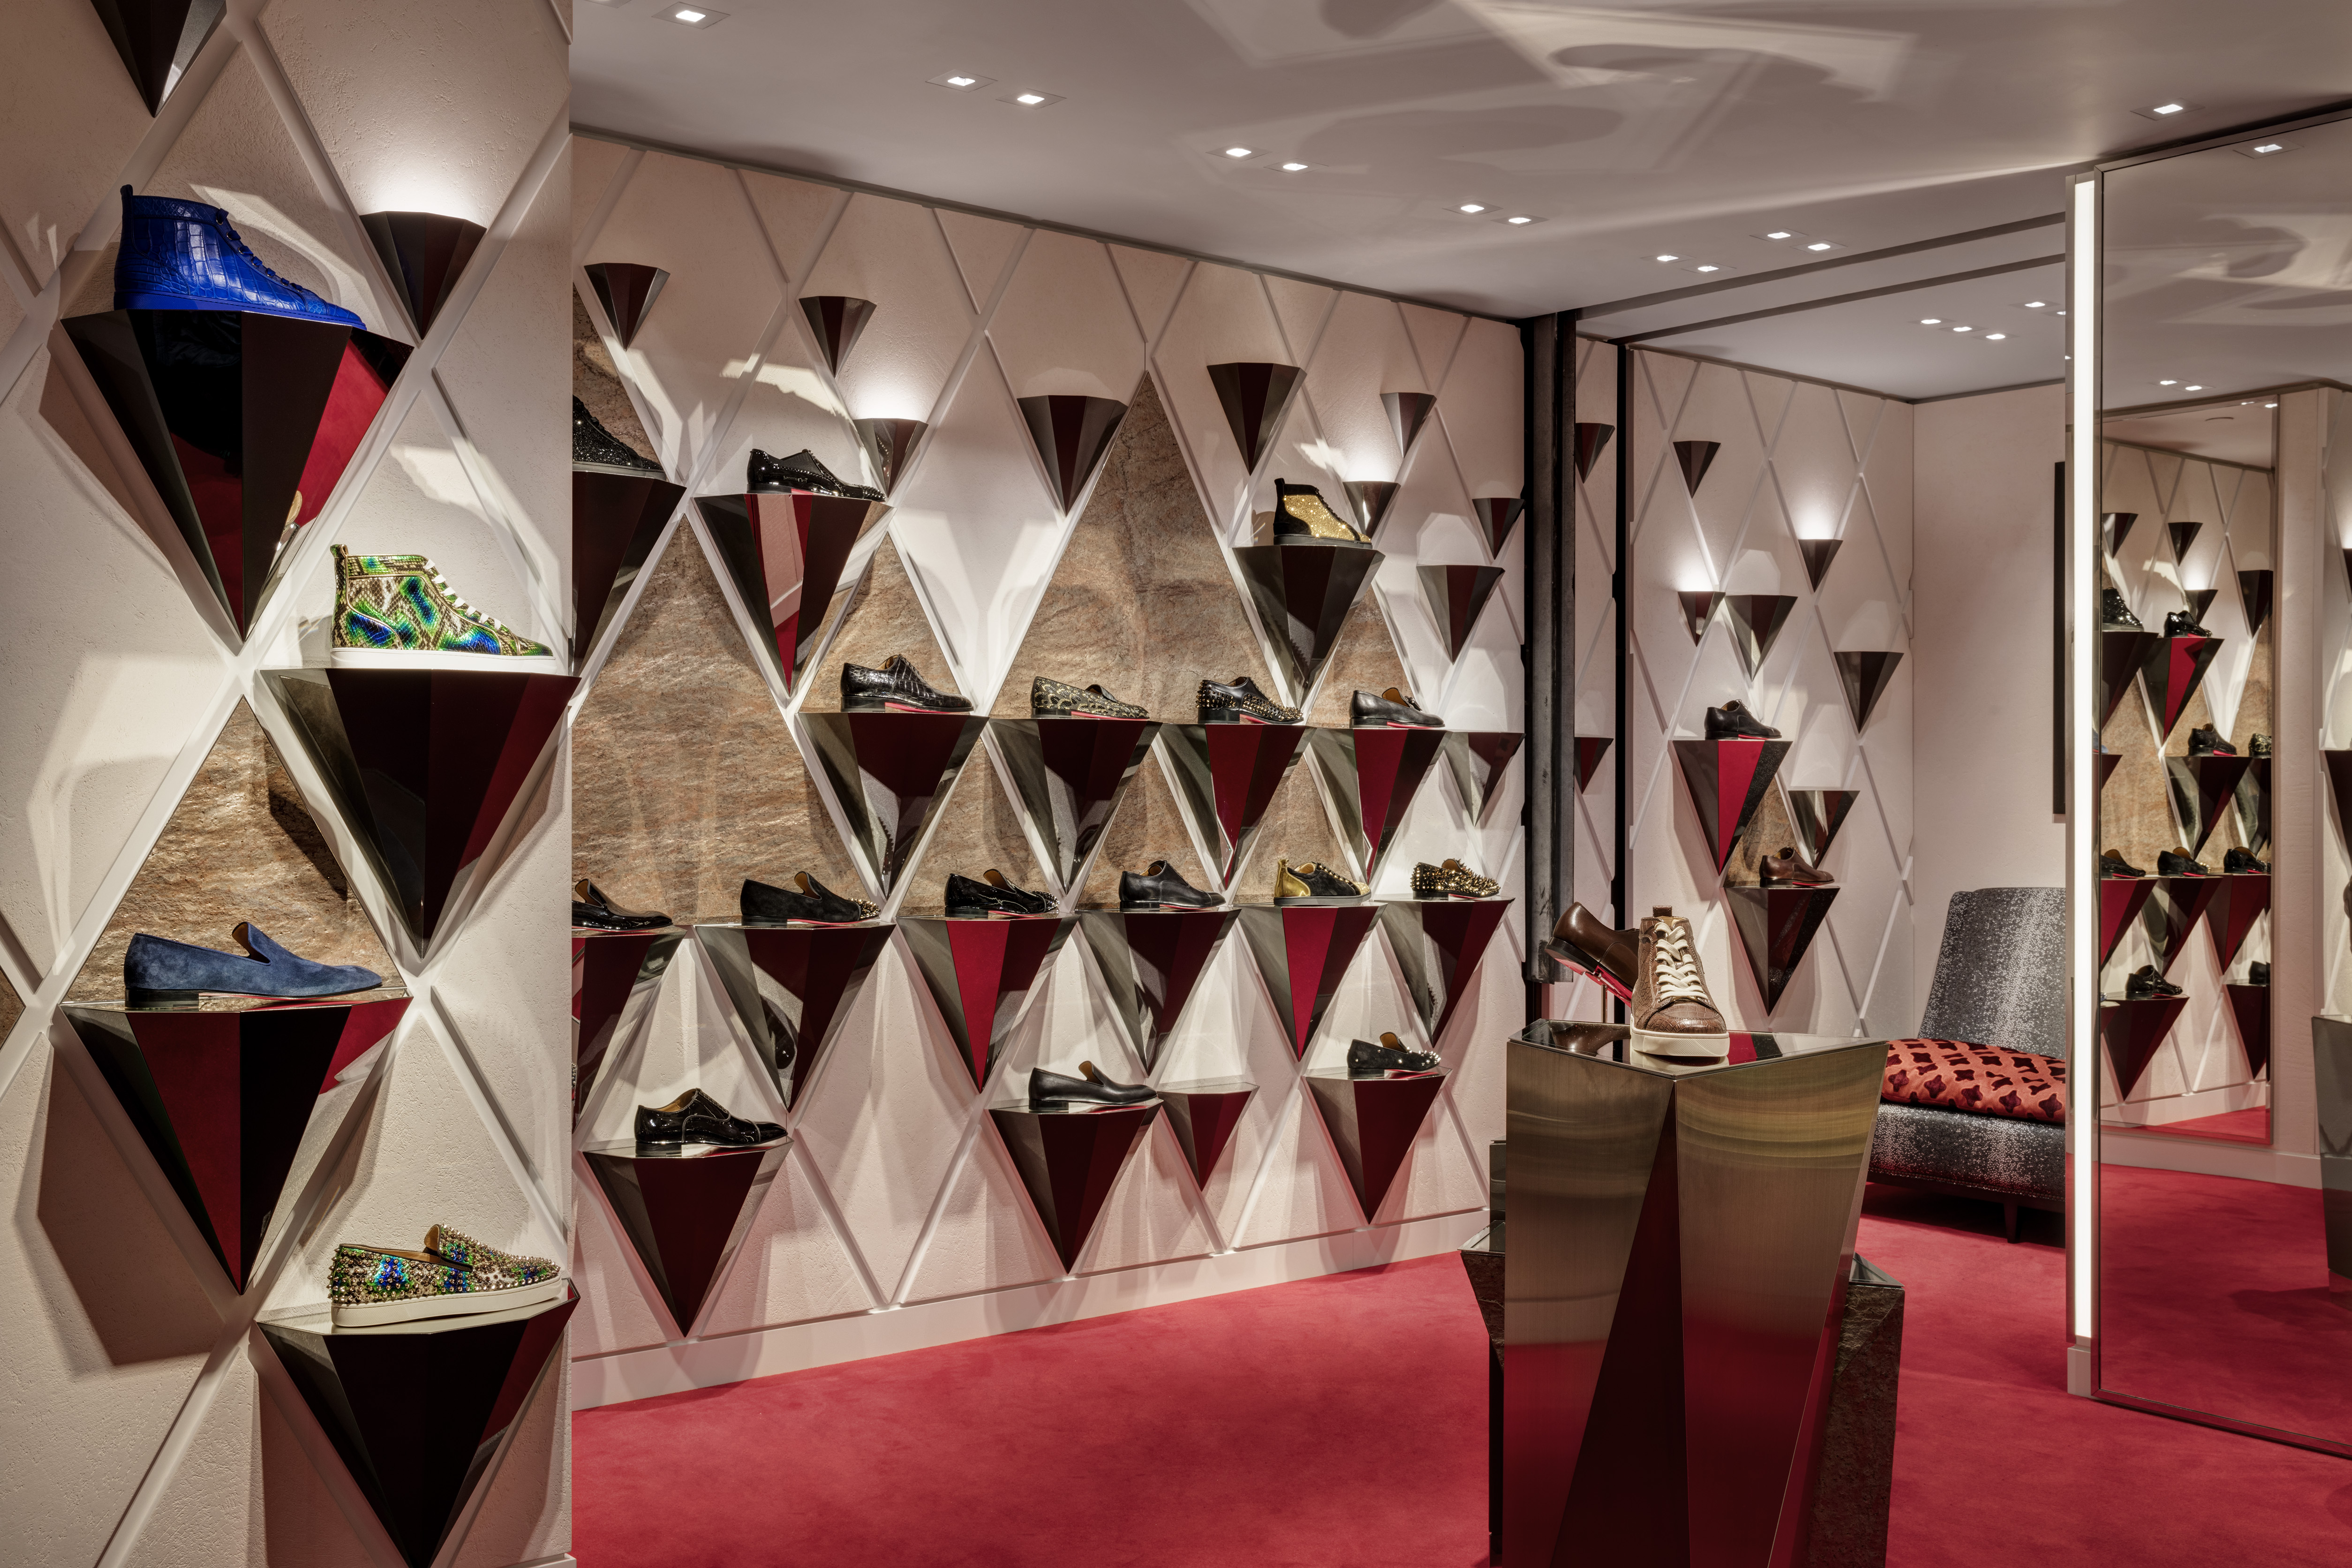 Store View. Christian Louboutin - Harrods, London, United Kingdom. Architect: N.a, 2016. Christian Louboutin - Harrods, London, United Kingdom. Architect: n.a, 2016.